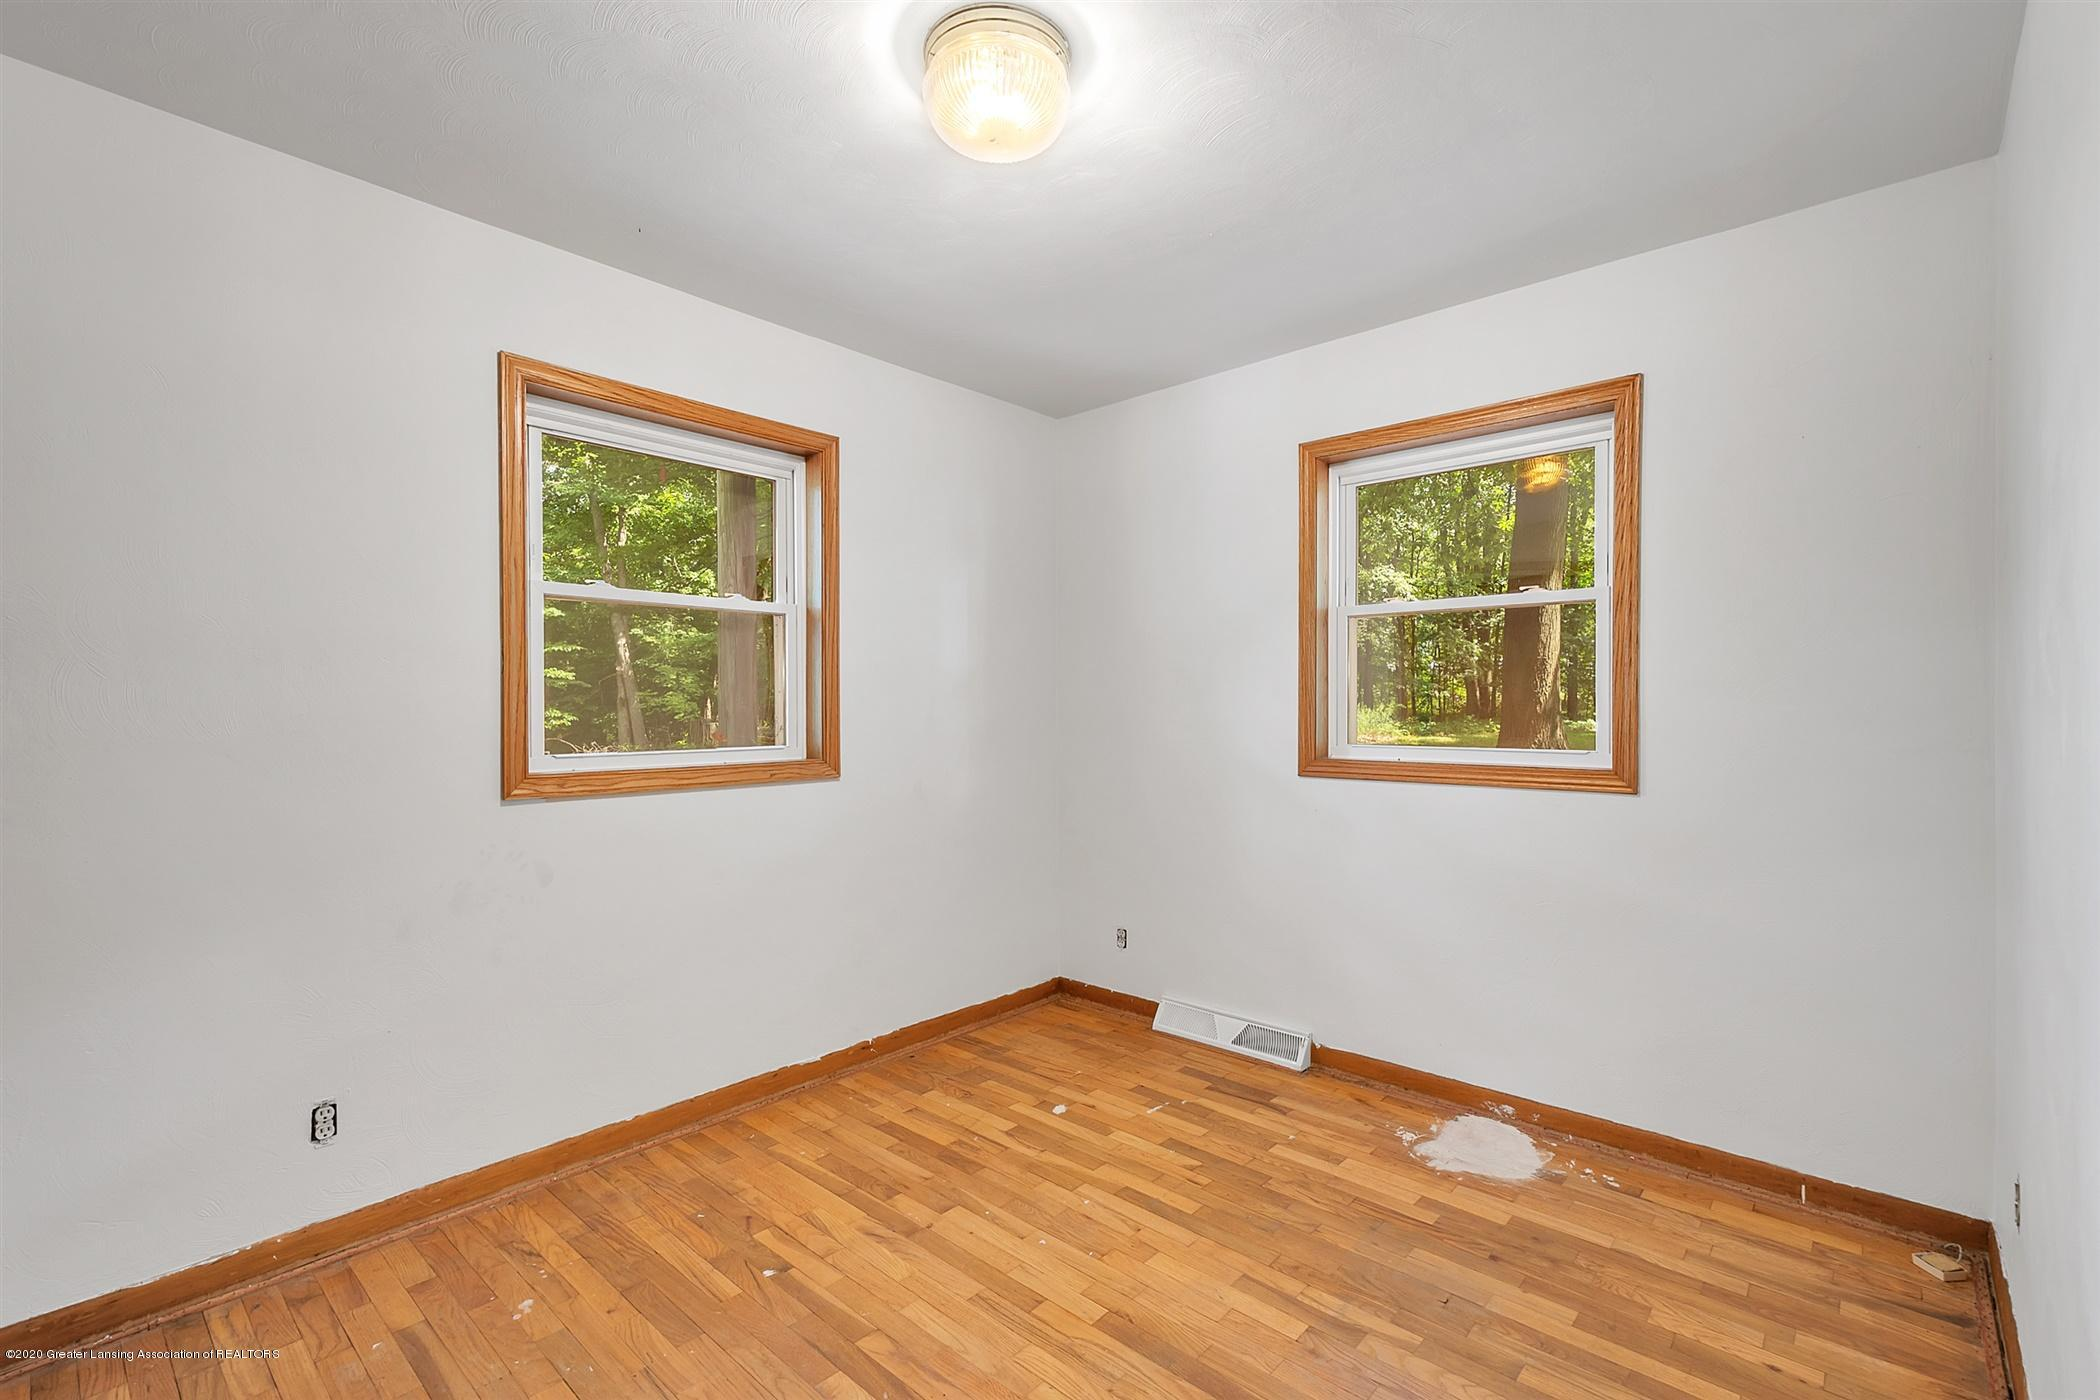 3269 S Waverly Rd - 16-3269 S Waverly Rd-windowstill-re - 17